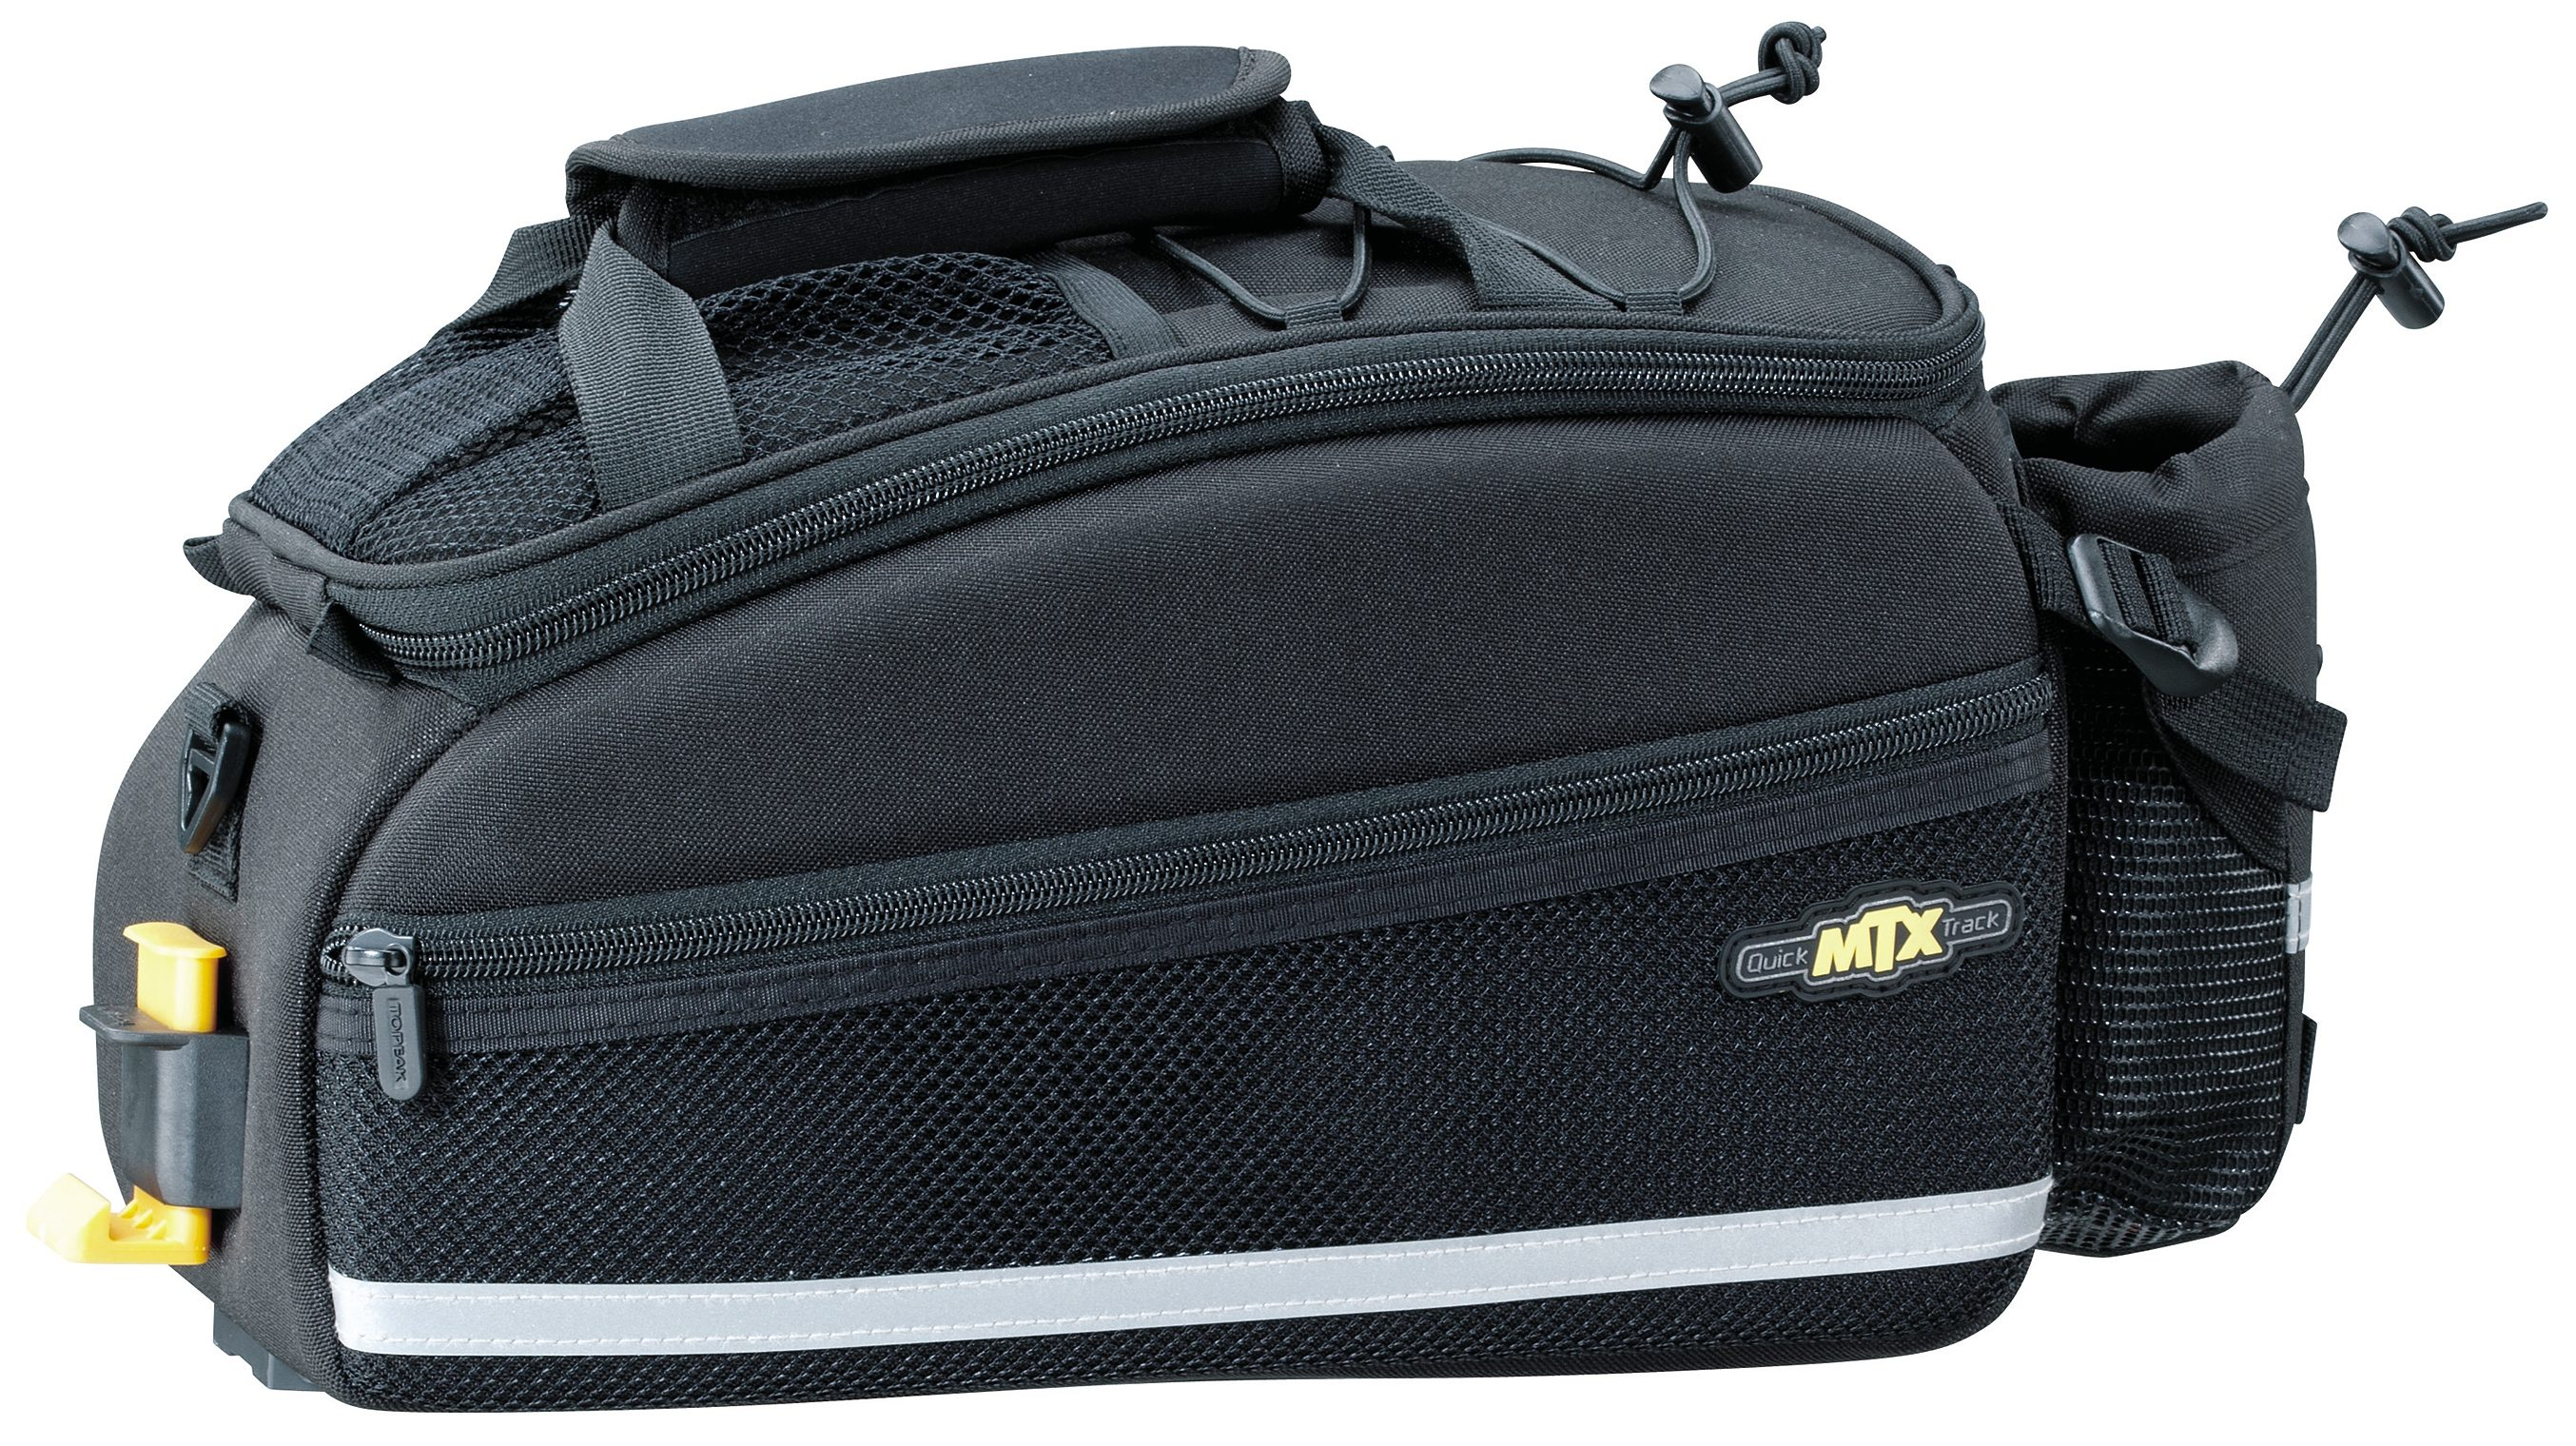 Topeak Gepäckträgertasche »MTX Trunk Bag EX«